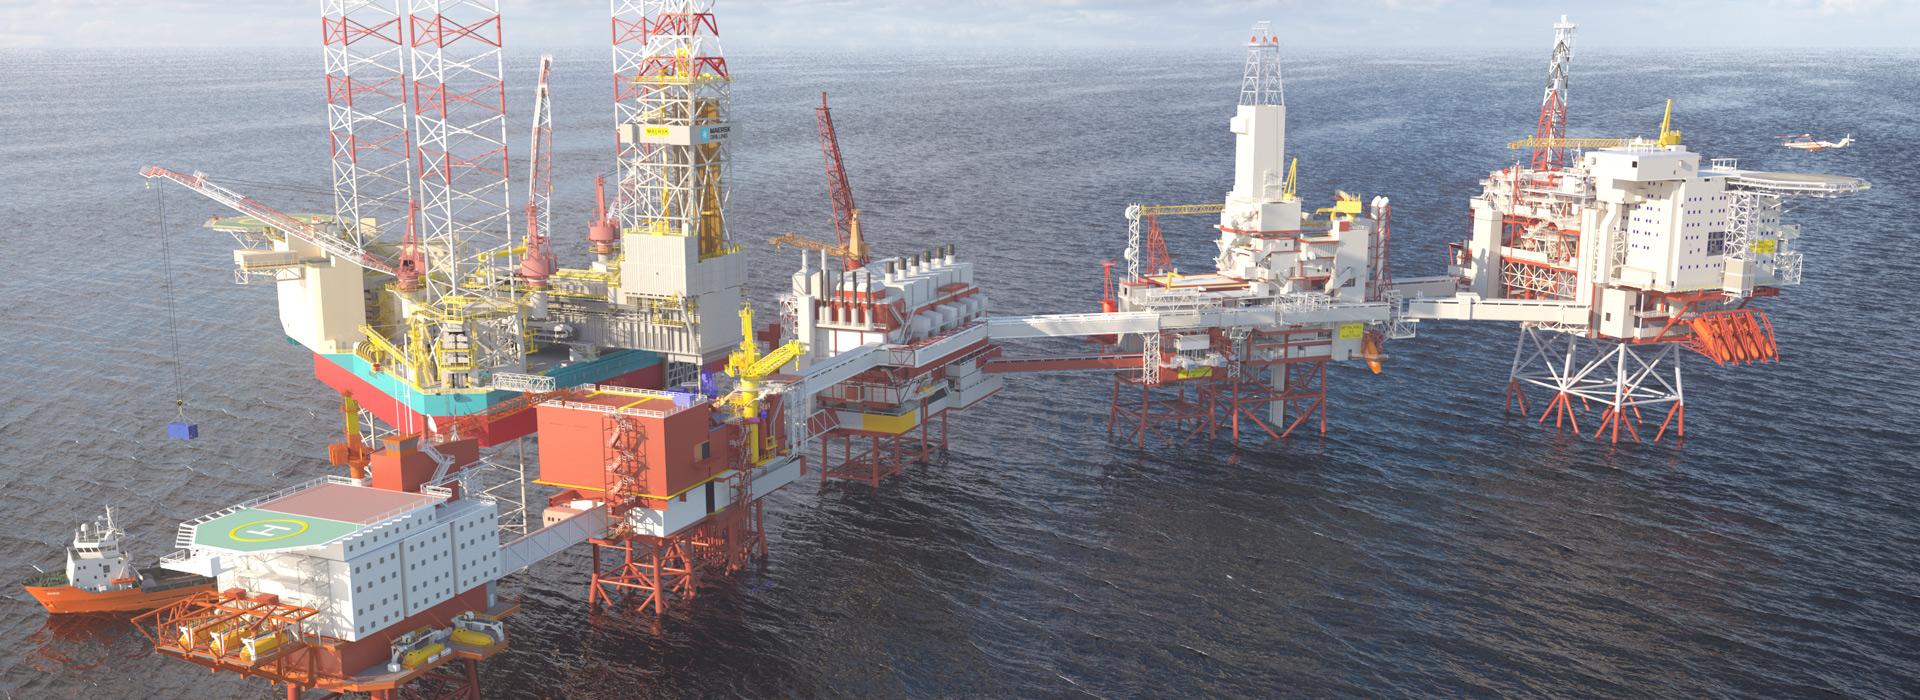 offshore-flied-7